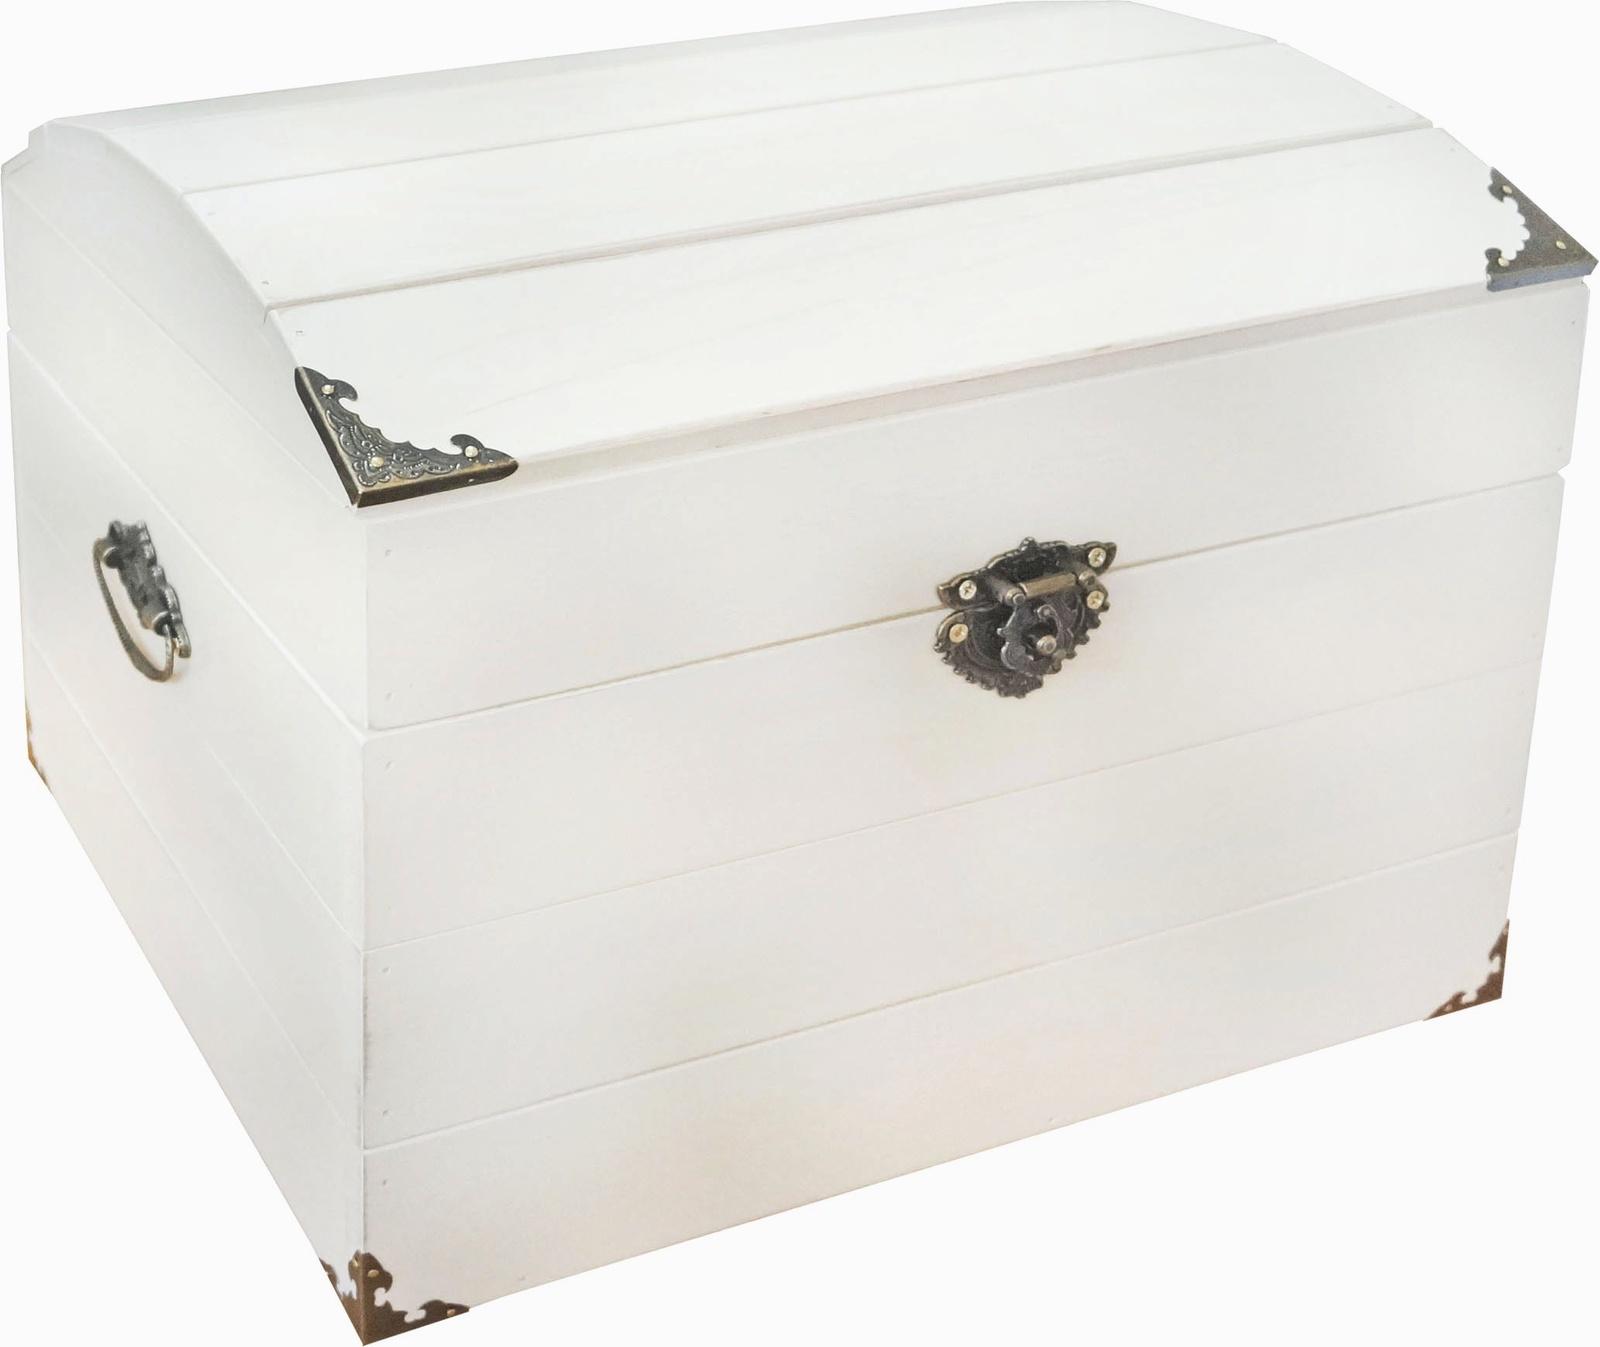 Коробка для хранения Мастер Рио Сундук белый, Дерево